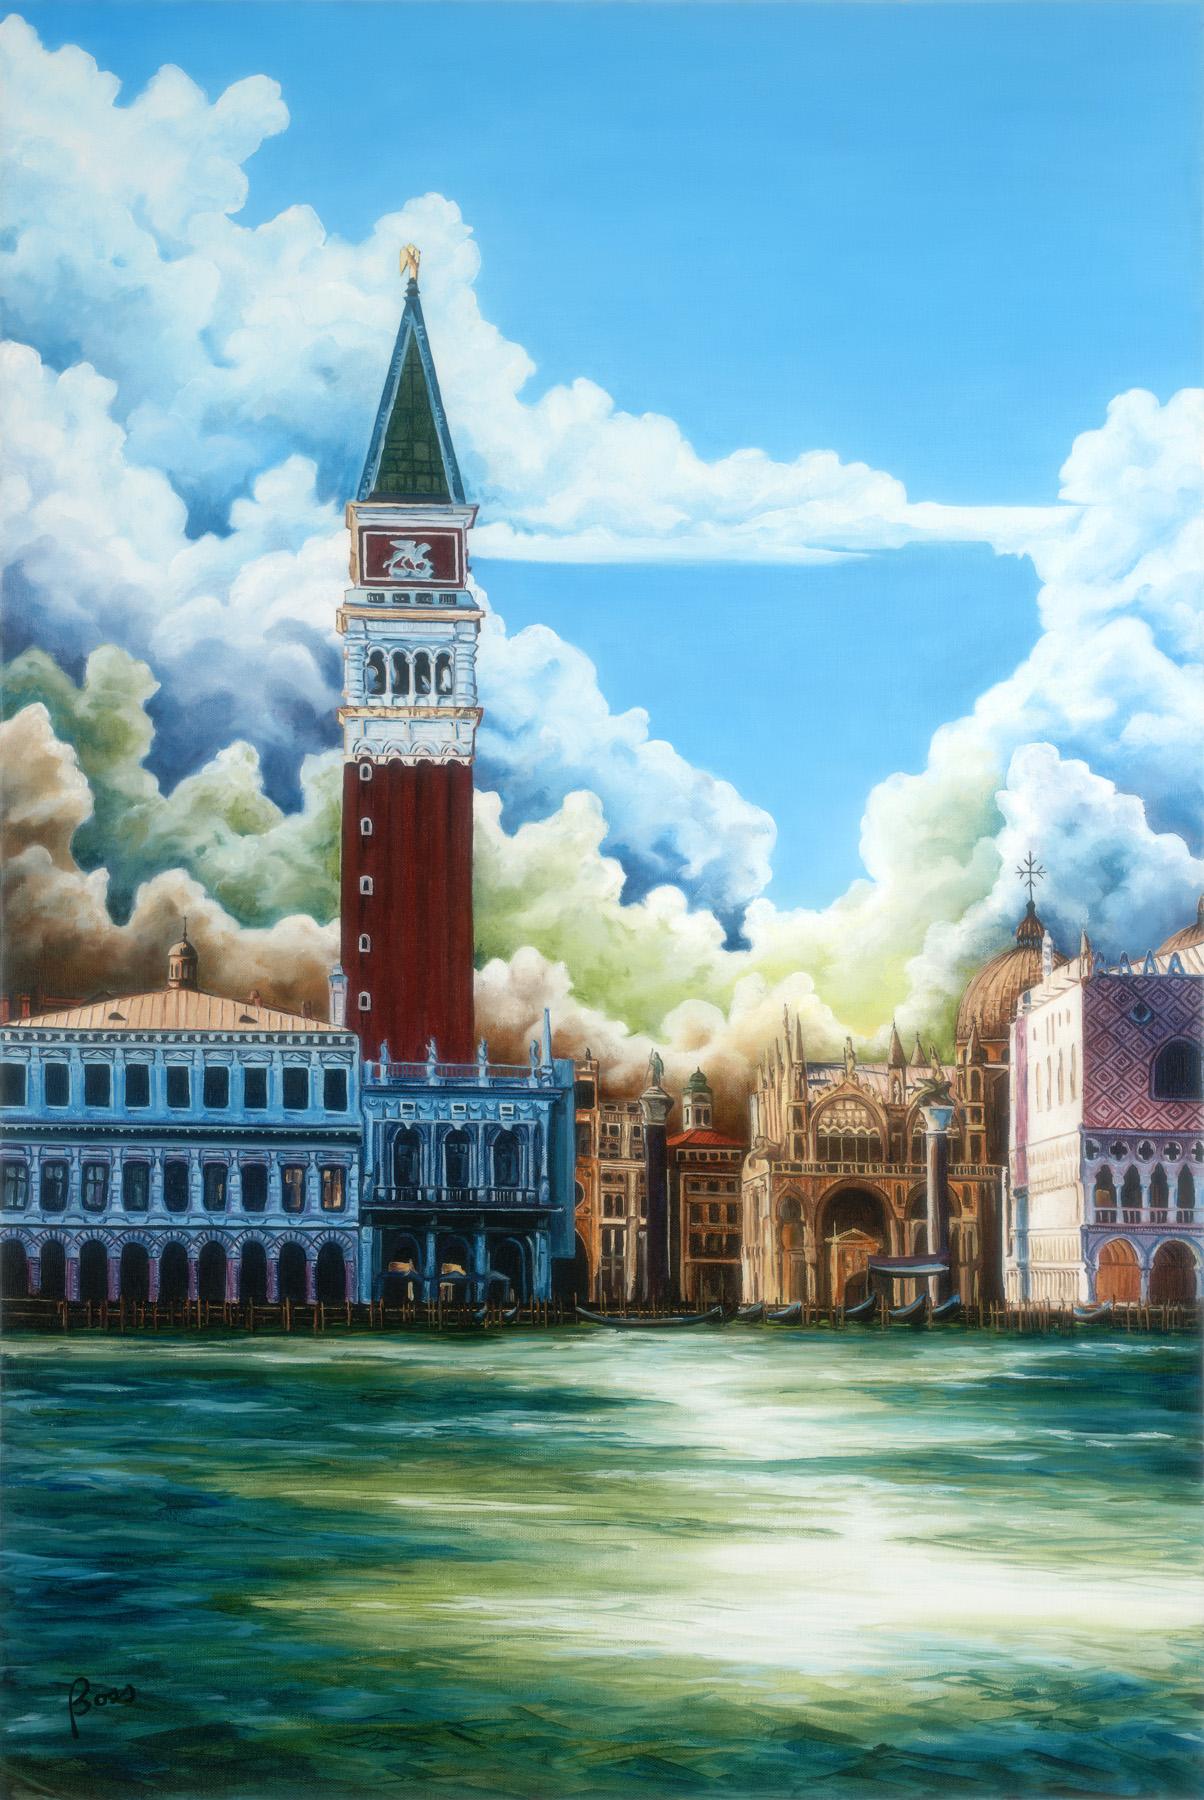 Venice Tower